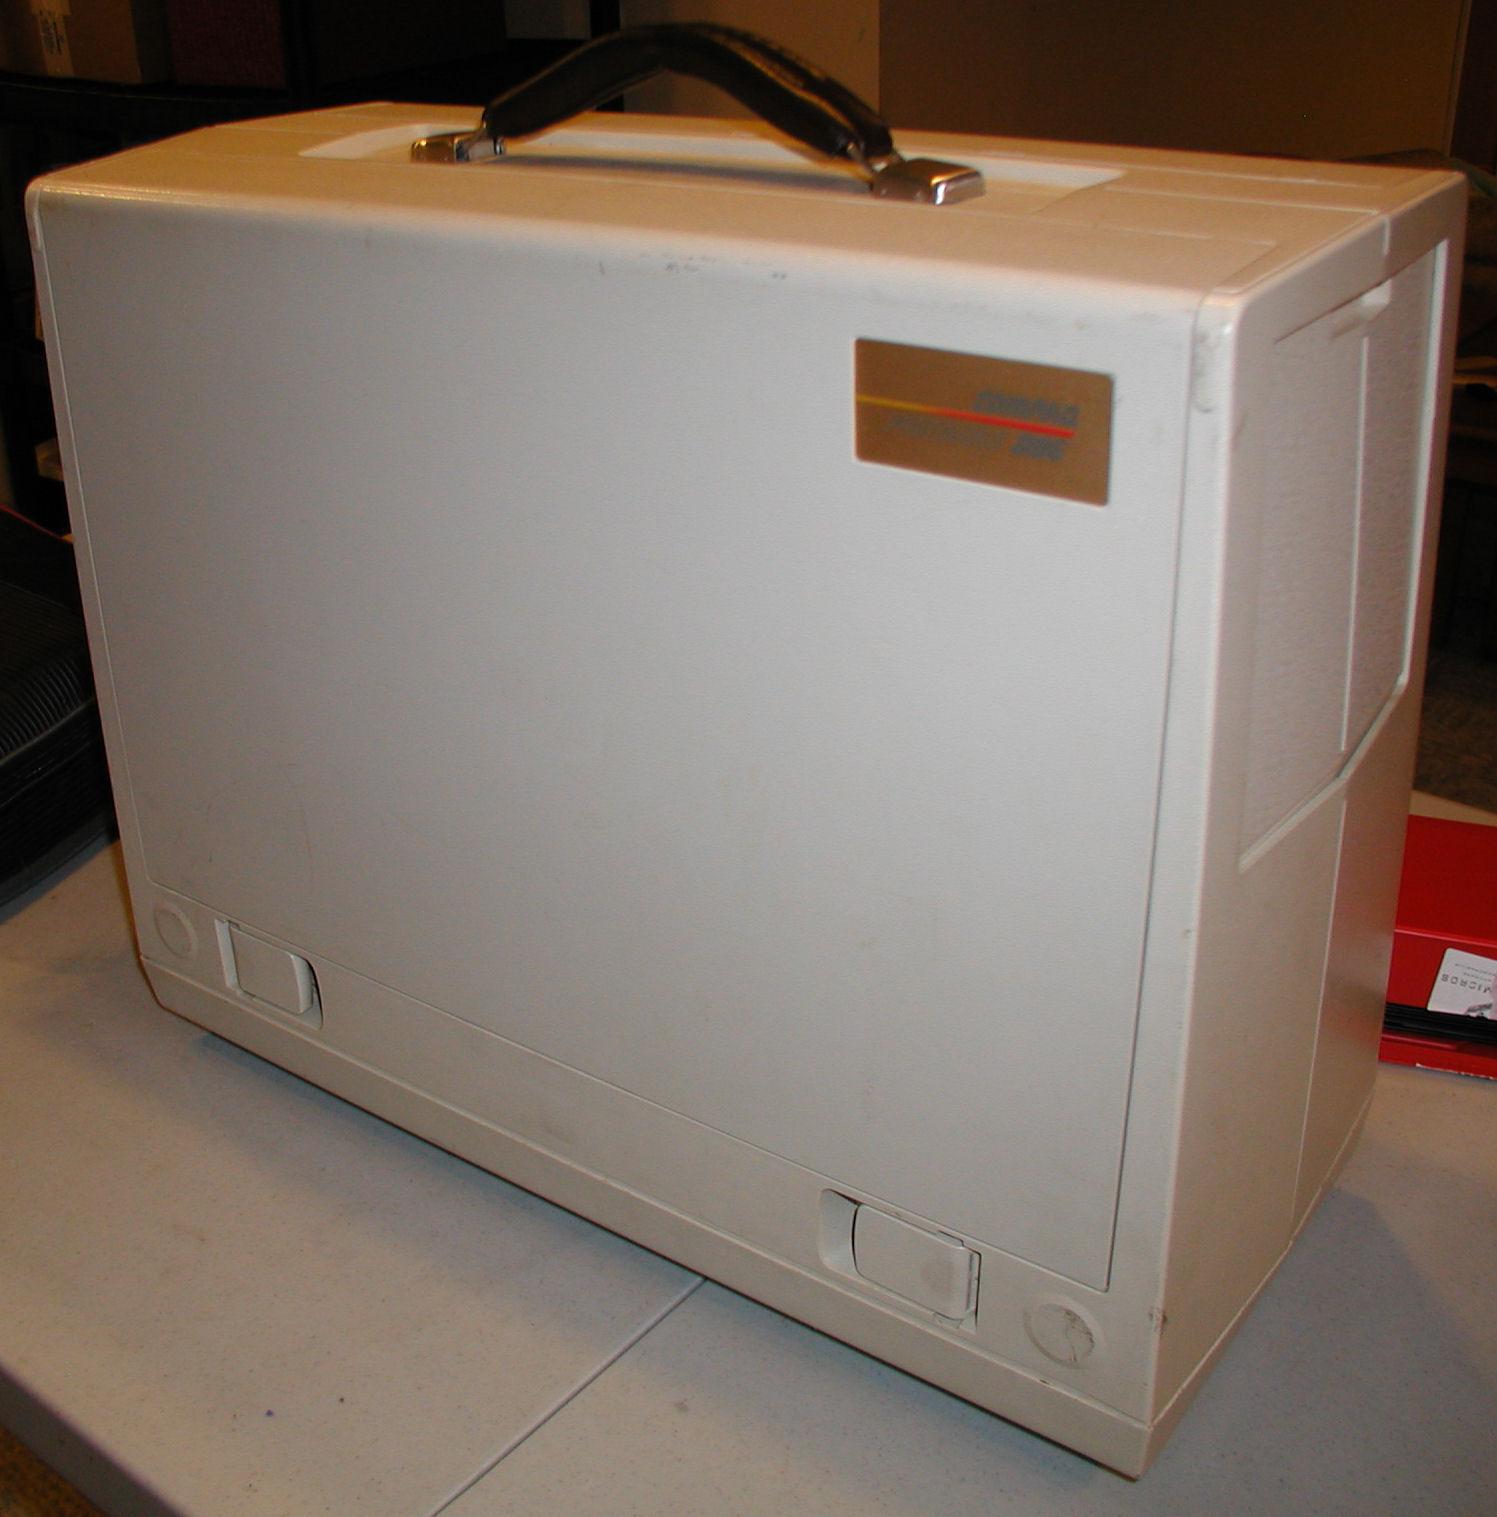 Compaq Portable-286 closed.jpg ...